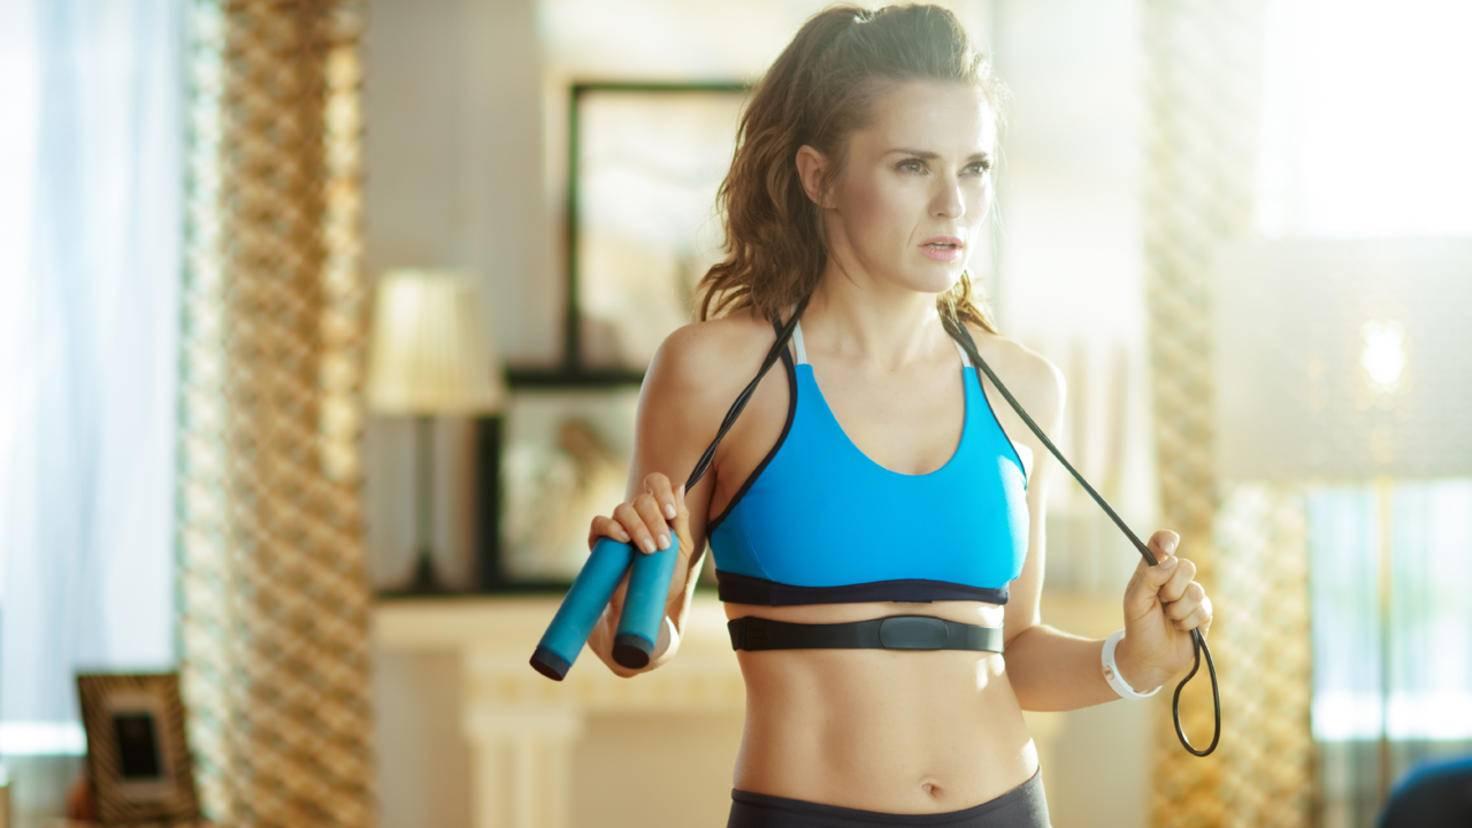 fitnessstudio-zu-hause-guenstige-geraete-springseil